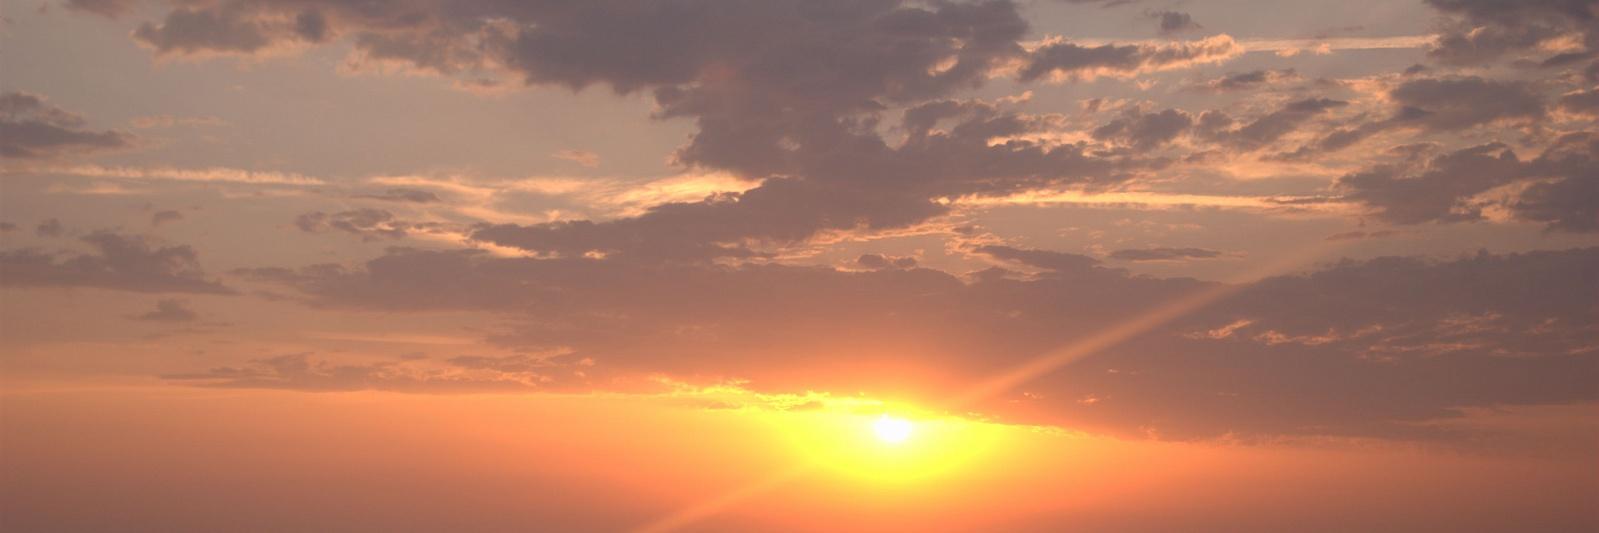 August's Dawn in Casalborsetti